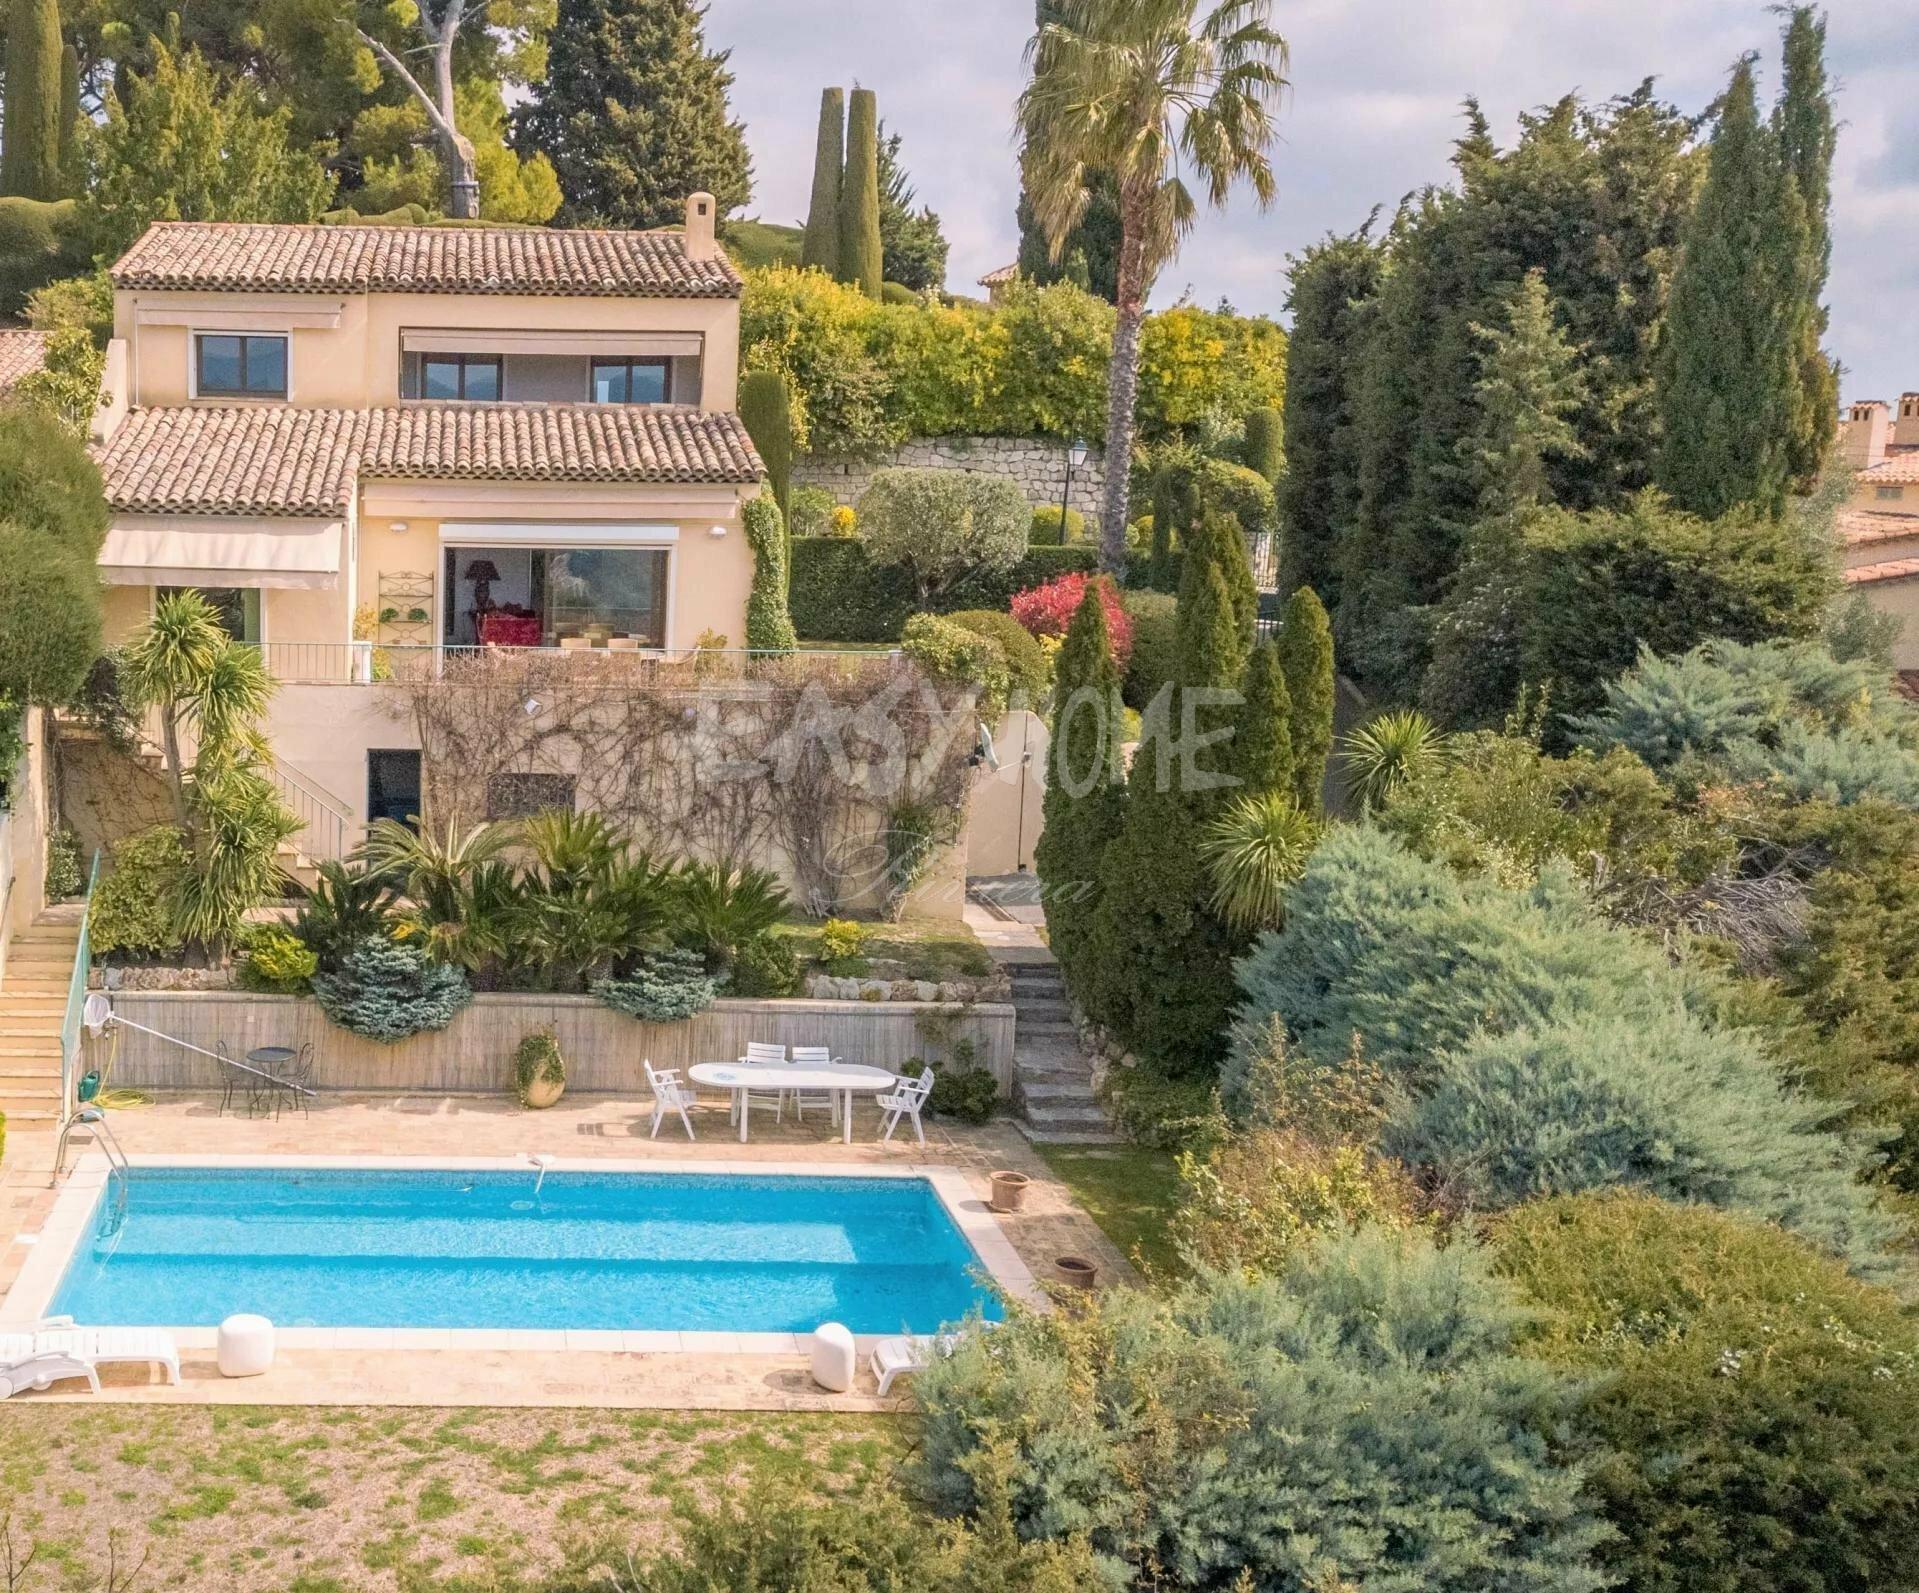 Villa in Mougins, Provence-Alpes-Côte d'Azur, France 1 - 11297493